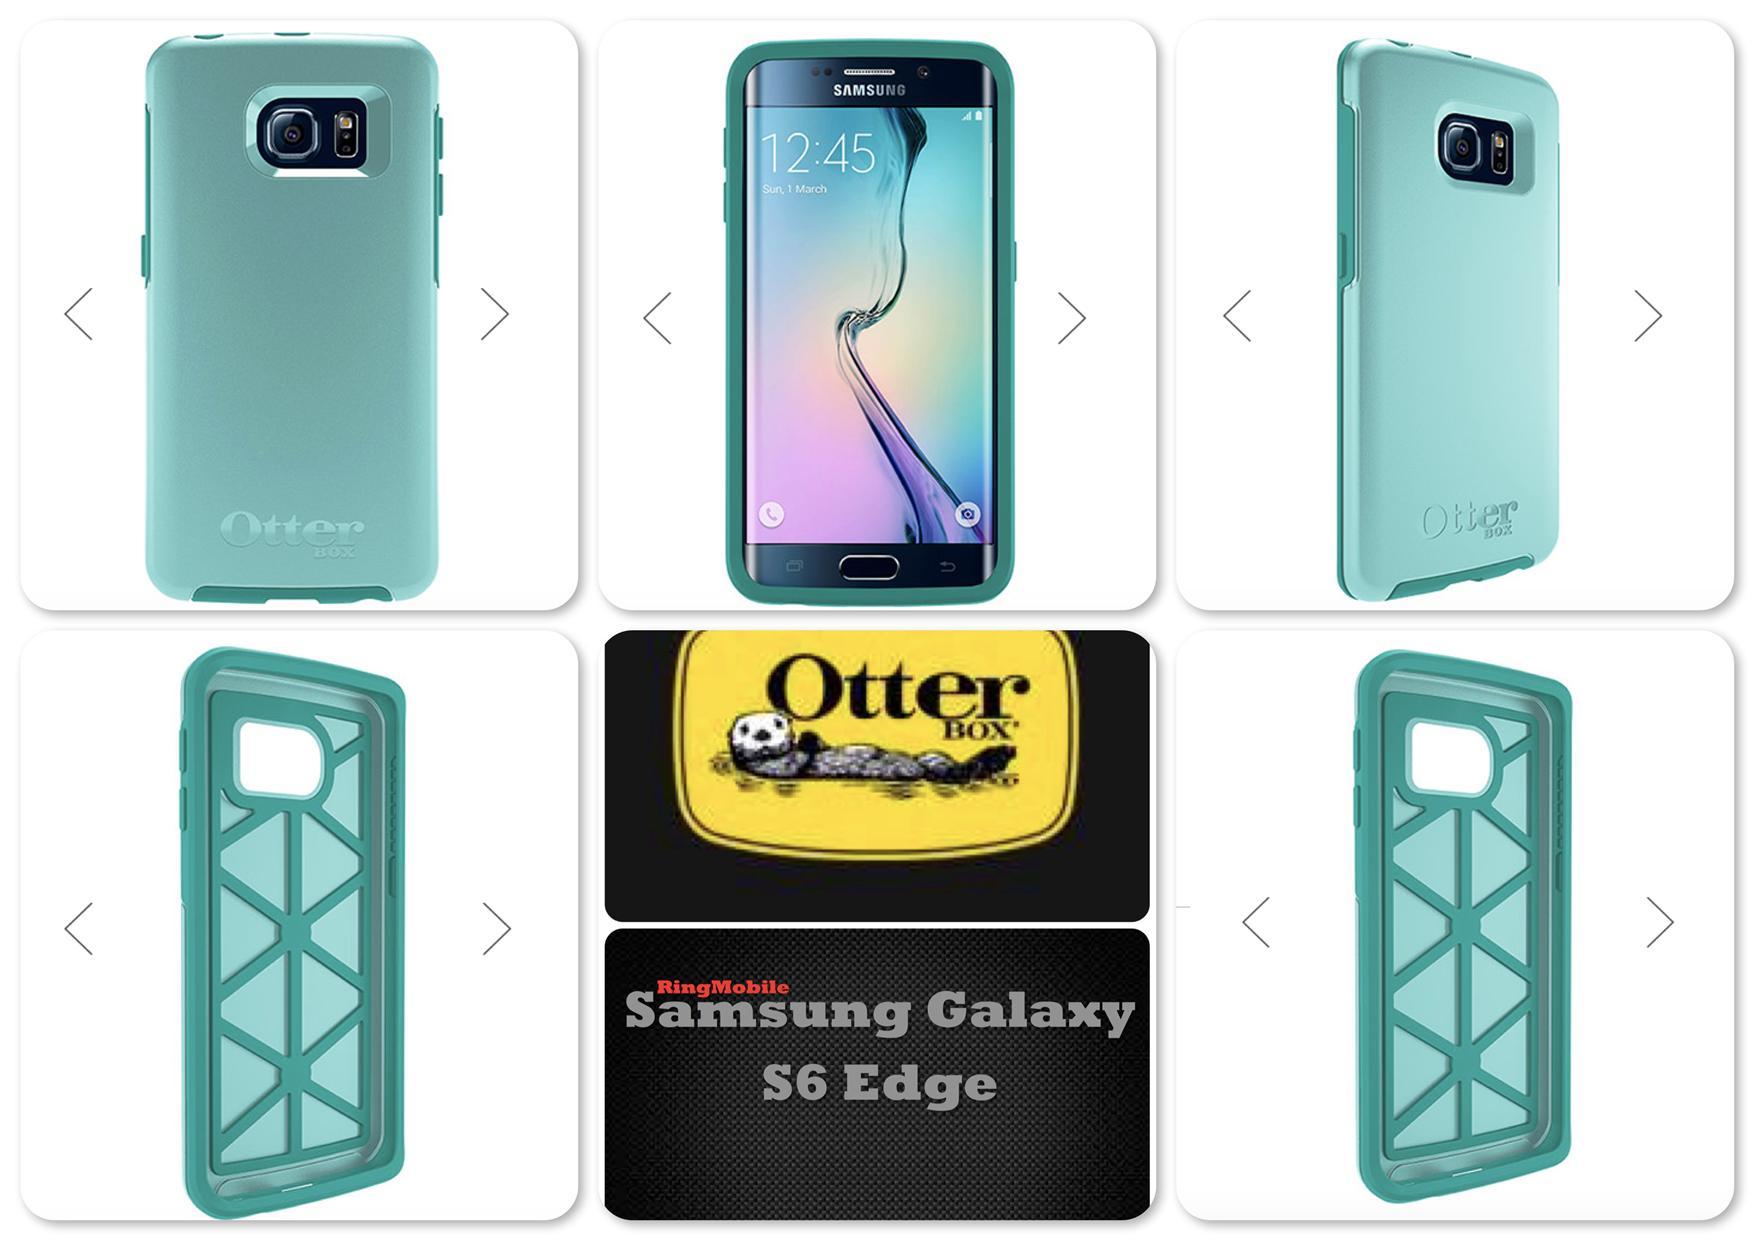 samsung s6 edge otterbox case